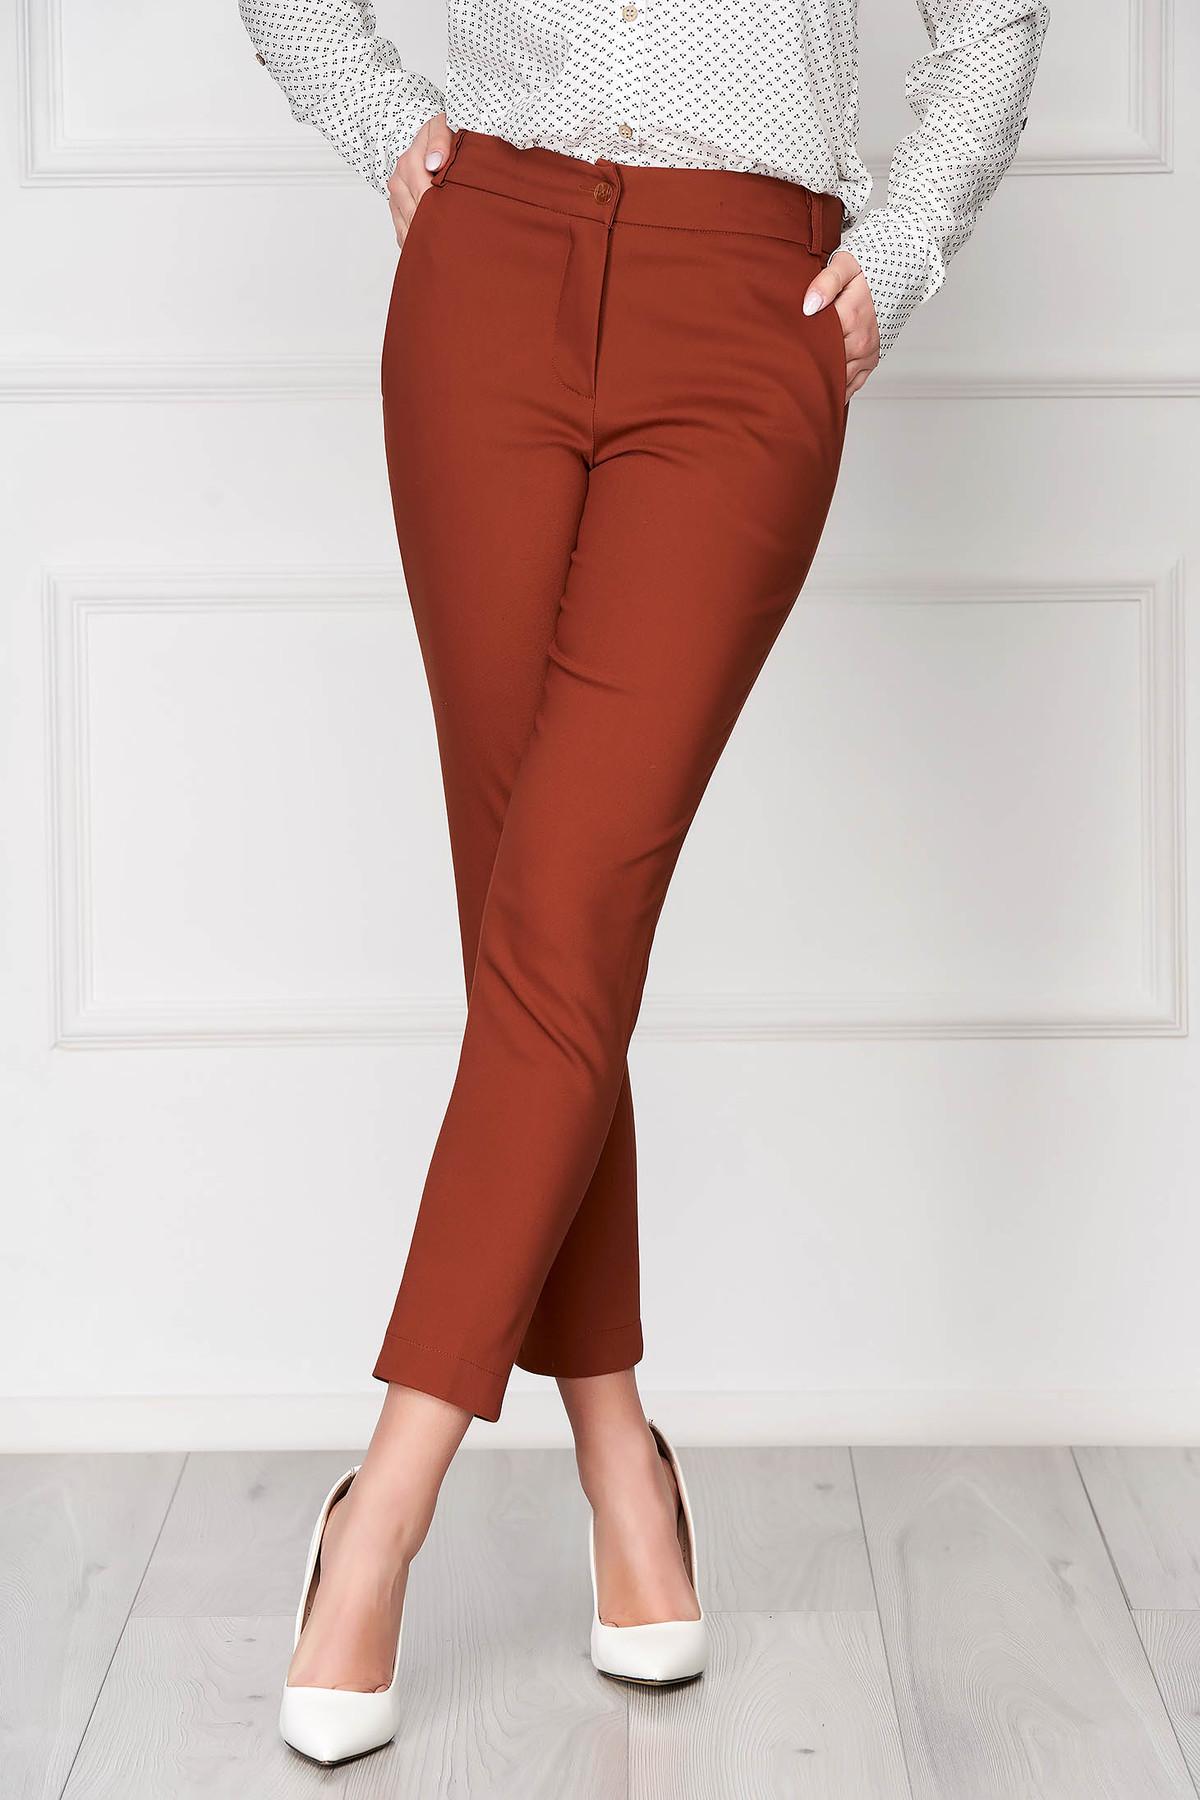 Pantaloni caramizii lungi eleganti cu talie medie conici din stofa subtire cu buzunare imagine